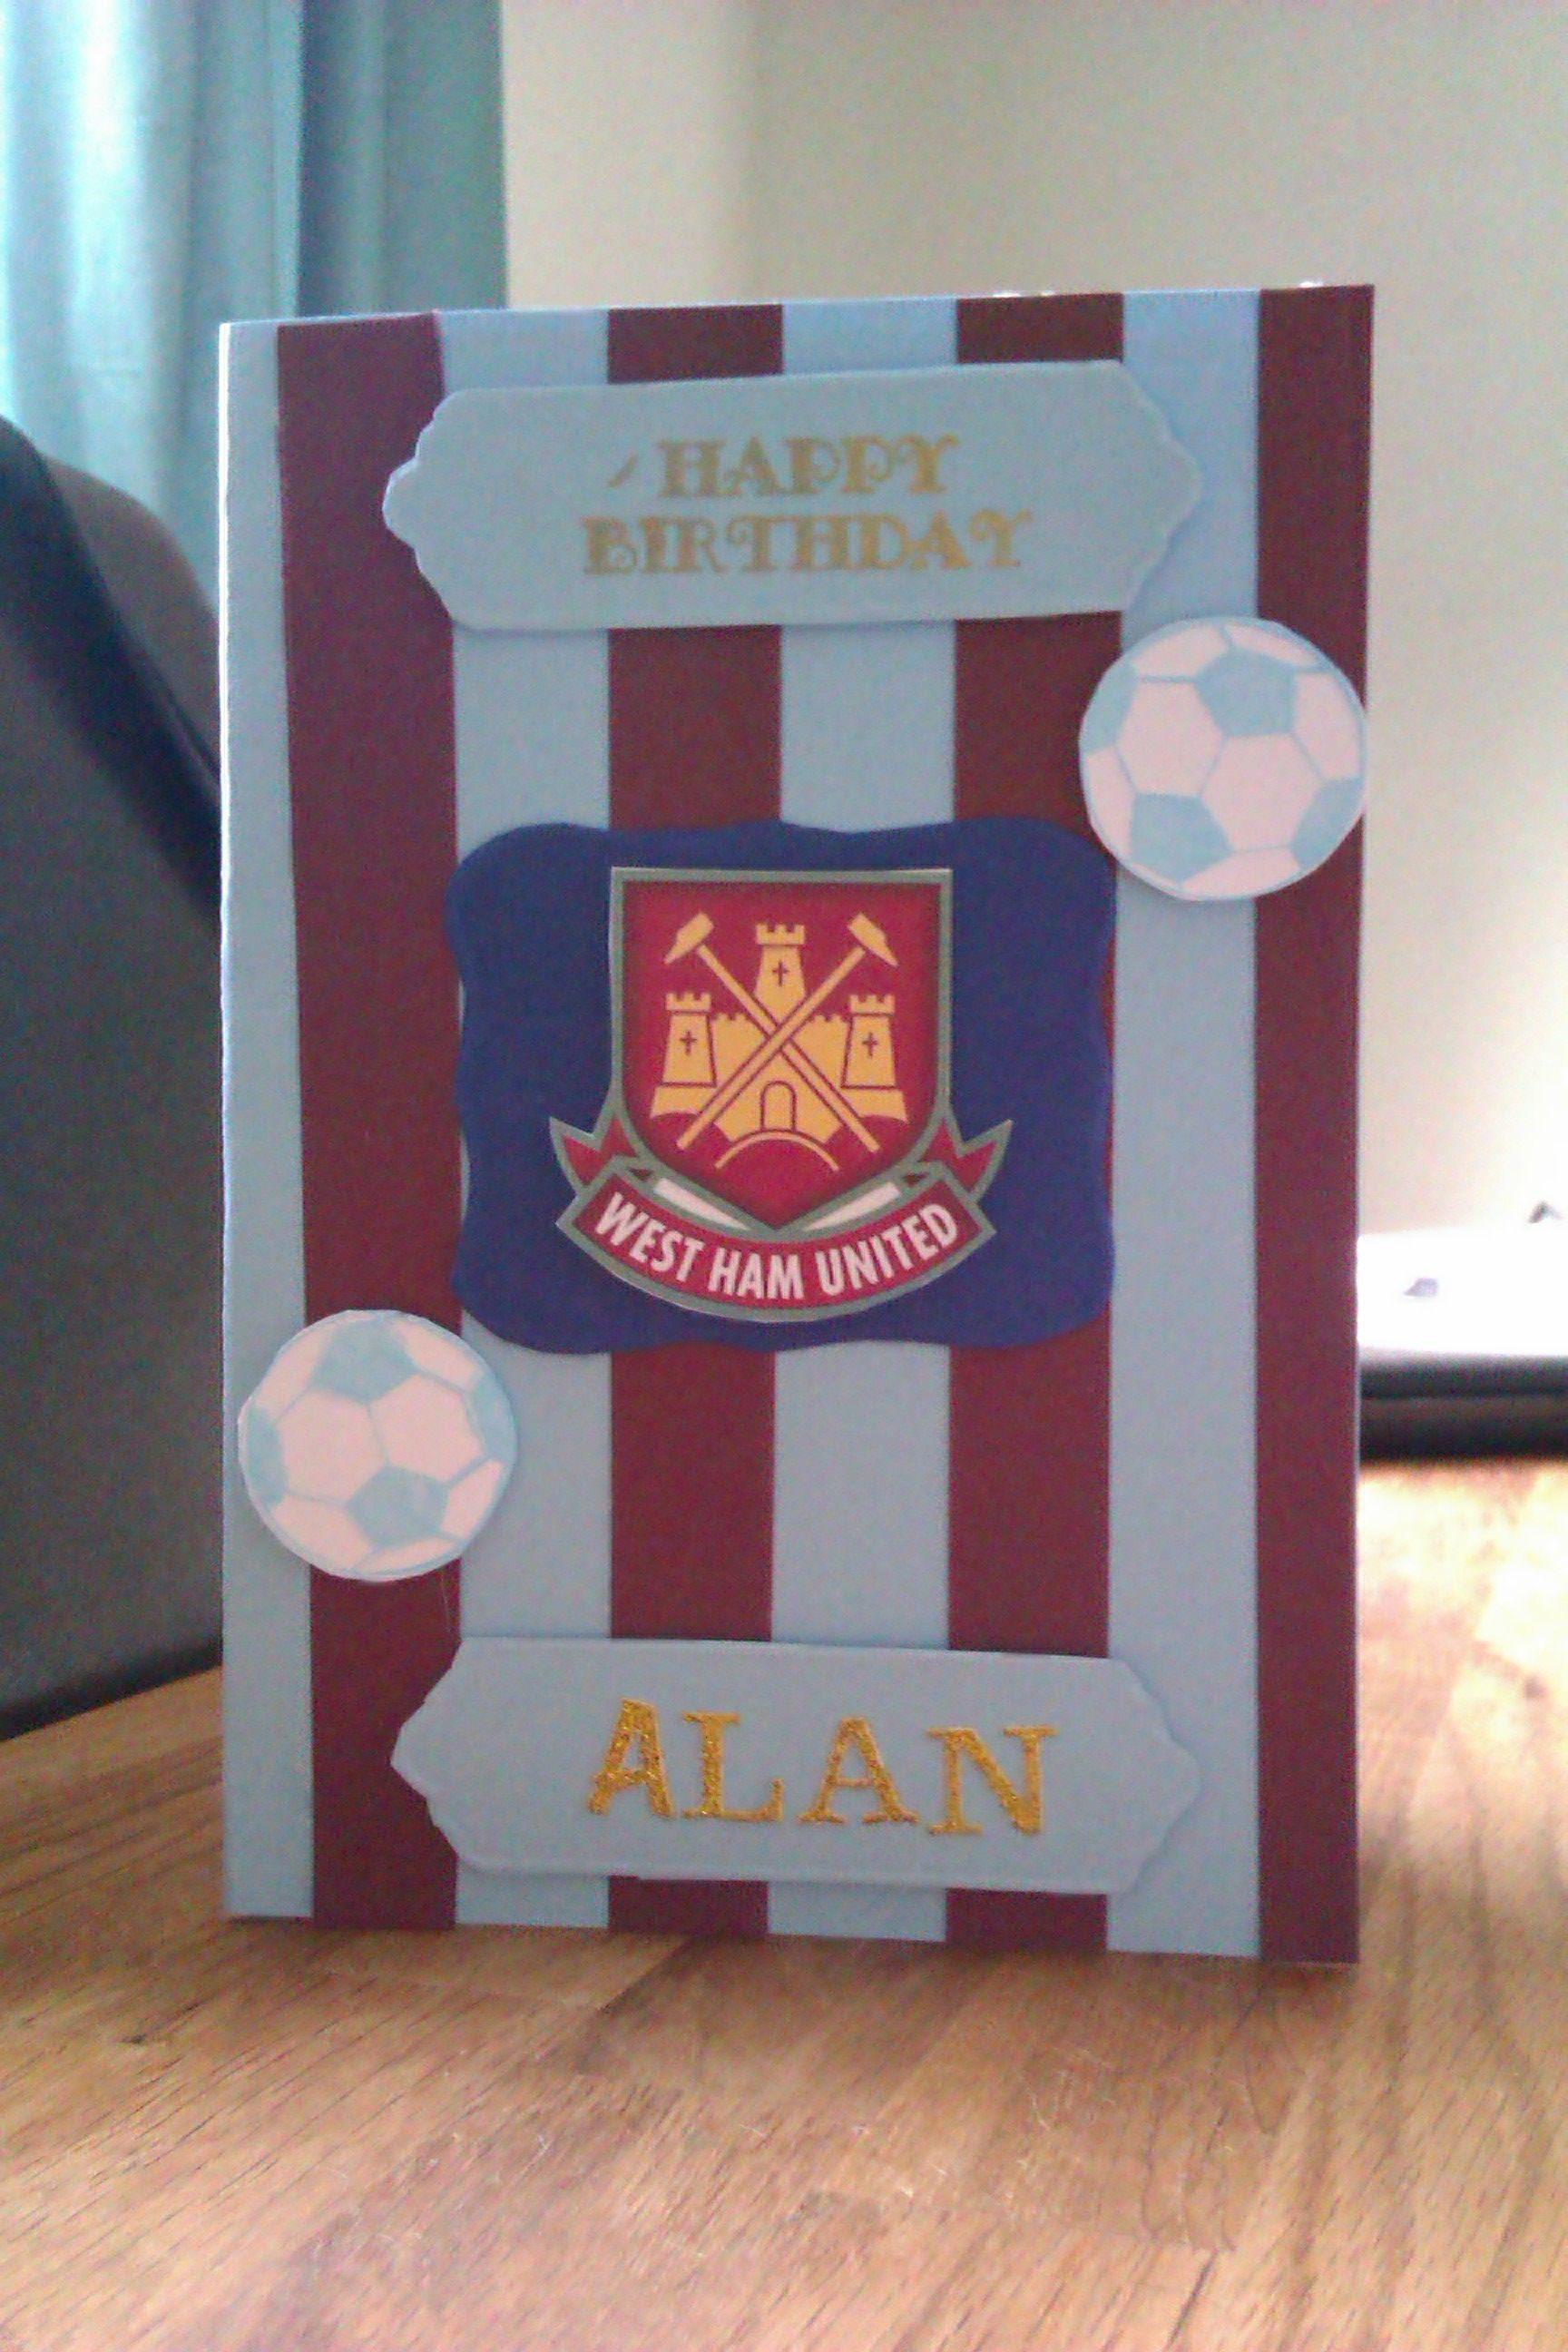 Football Themed Birthday Card Based On West Ham Colours Masculine Birthday Cards Birthday Cards For Men Football Theme Birthday